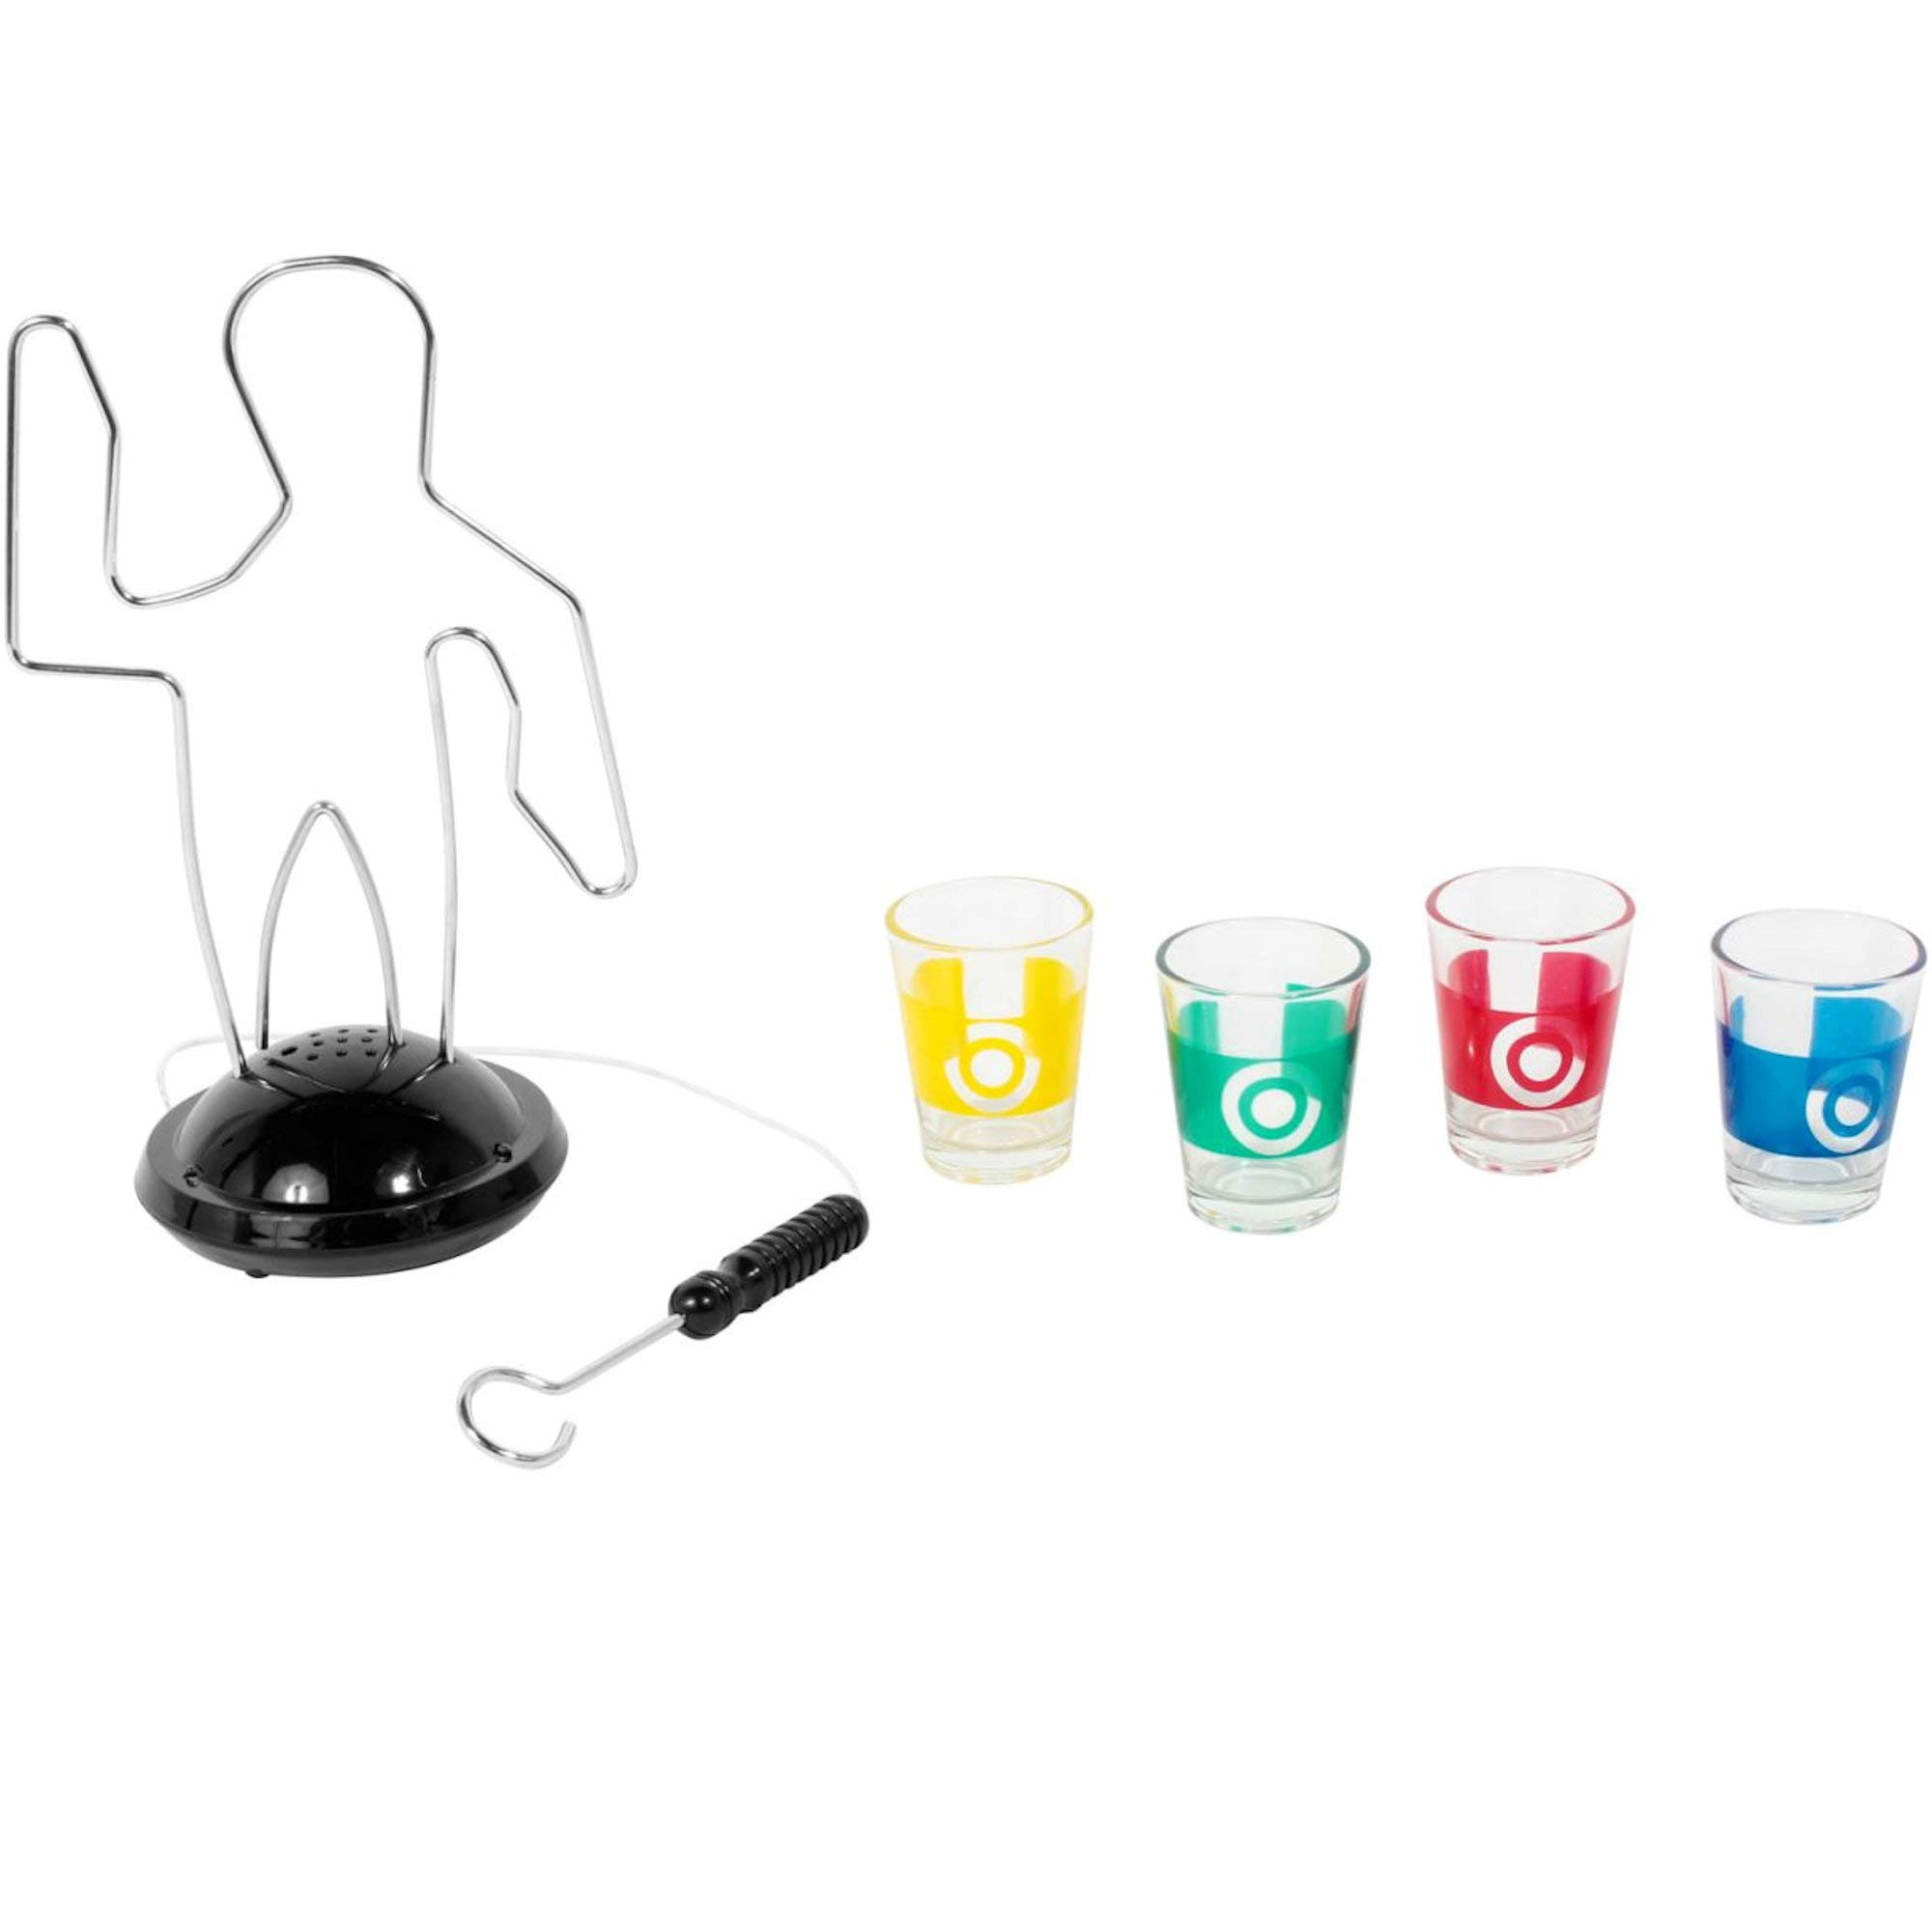 LE STUDIO】 Buzzard Drinking Game by LE STUDIO